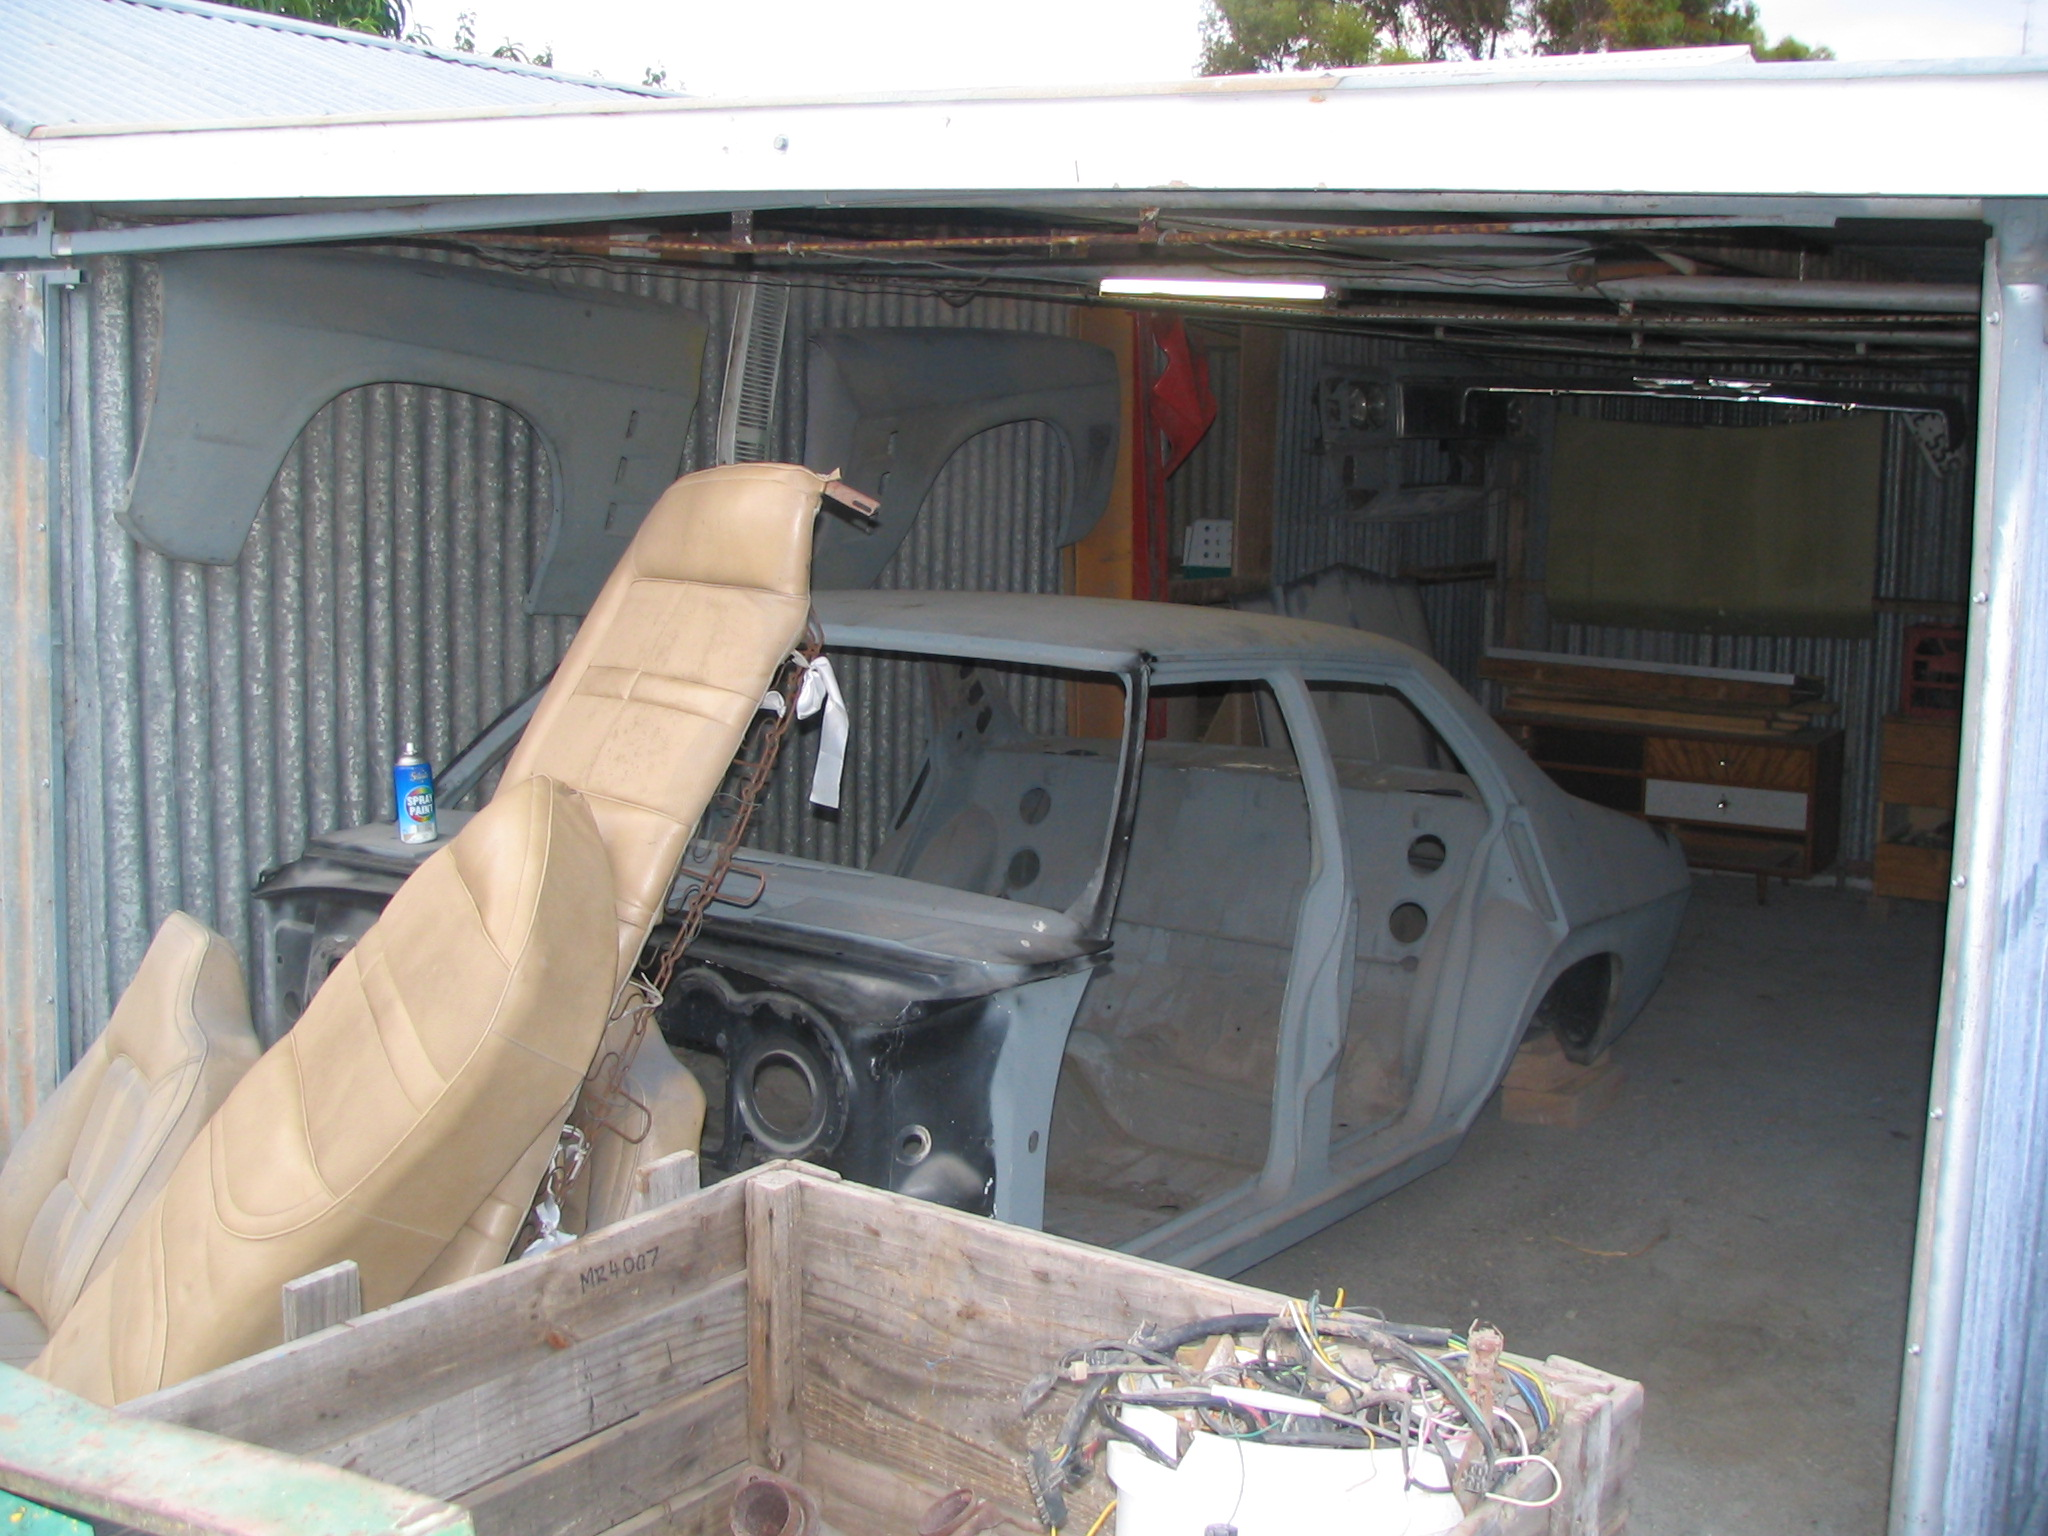 medium resolution of current trim original but all pulled apart original paint 568 30521 current paint 10year old primer original driveline l31 m41 gu4